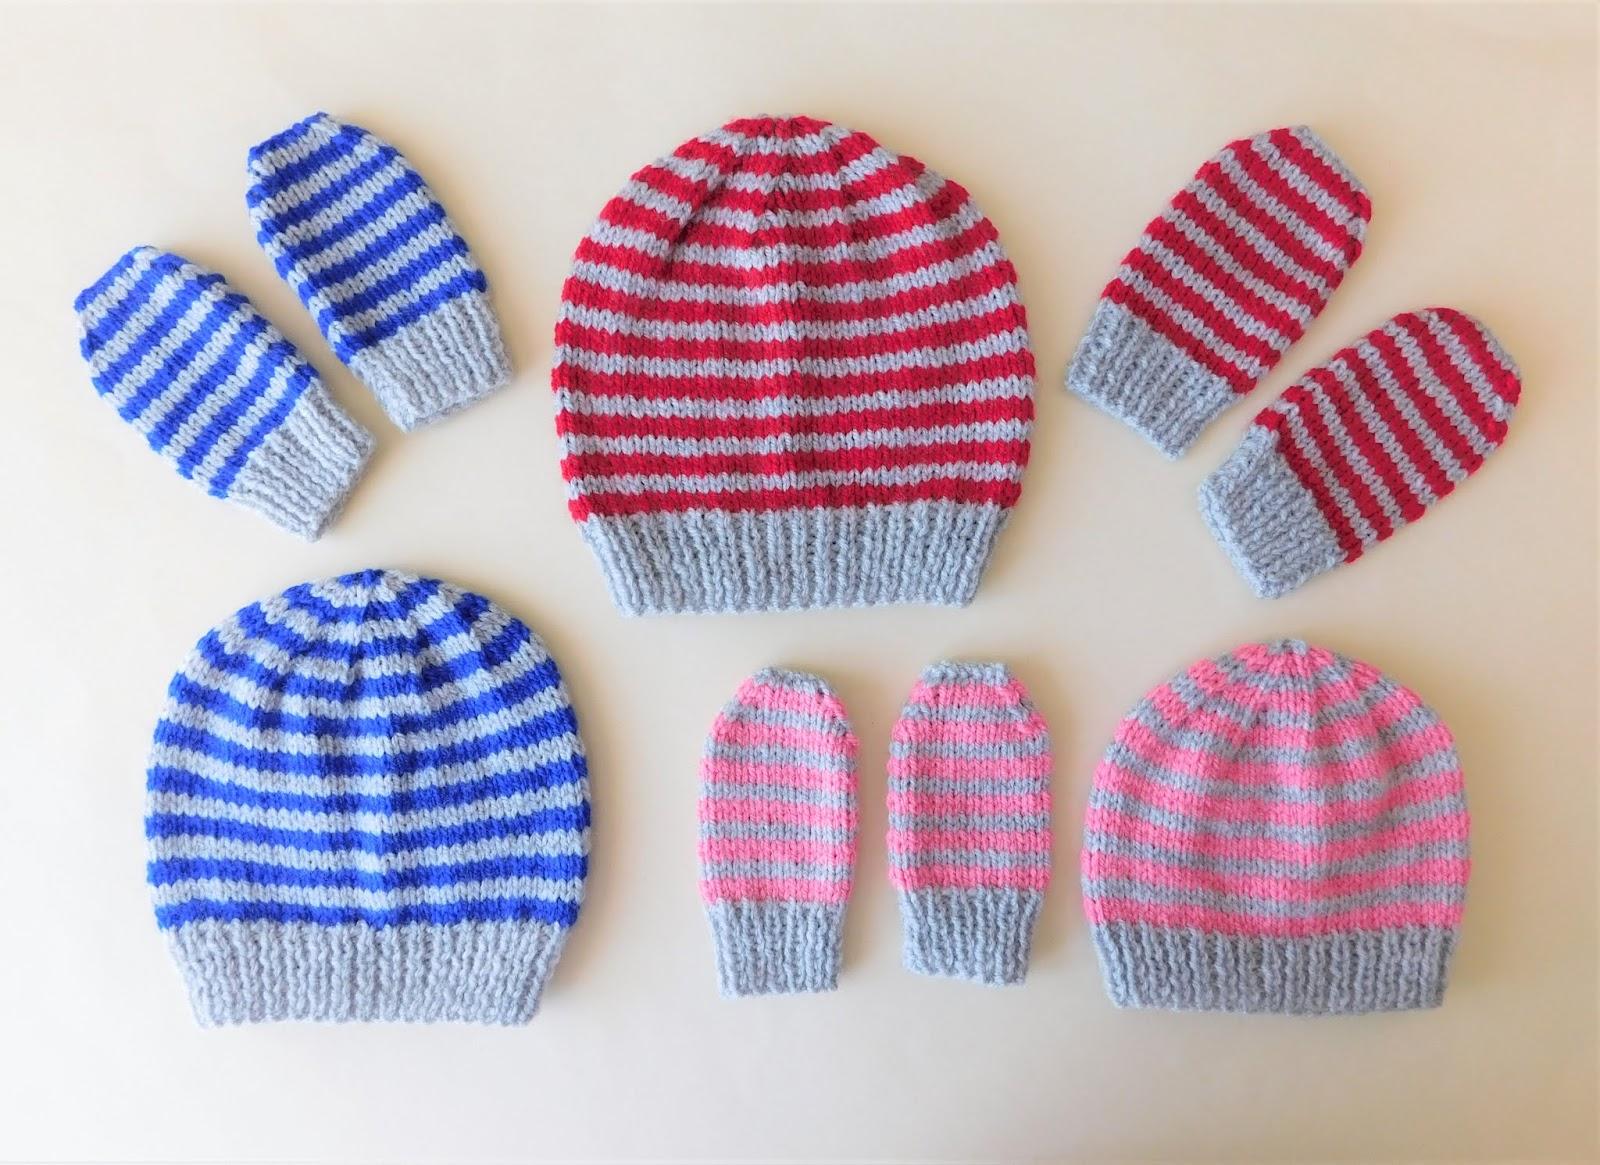 Marianna s Lazy Daisy Days  Simple Stripes Baby Beanie Hat   Mittens fff4382565f4